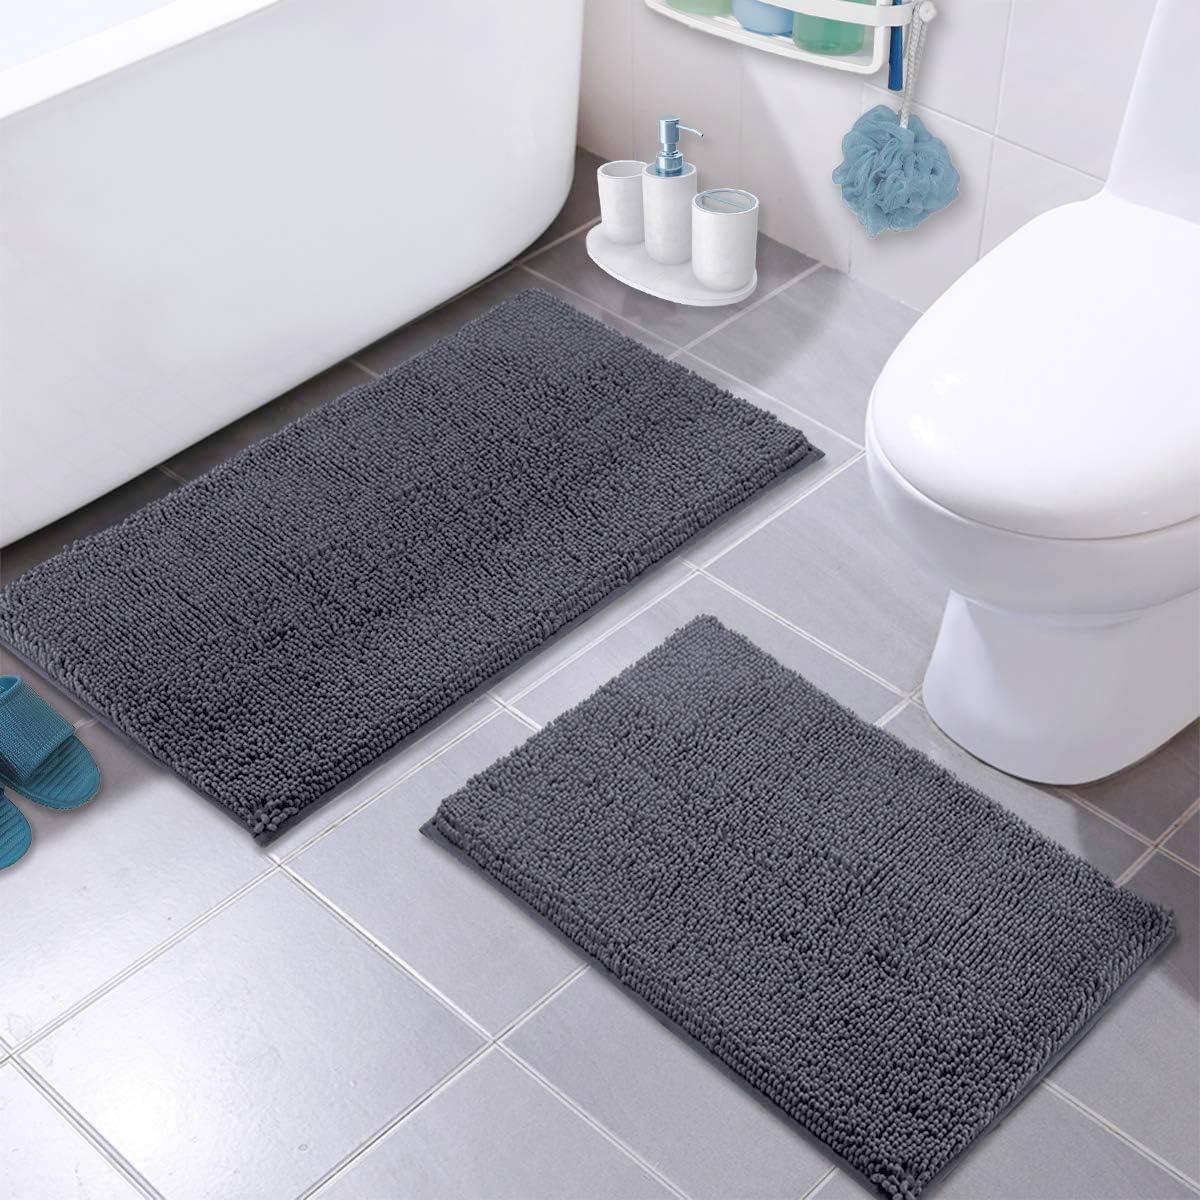 LuxUrux Bathroom Rug Set–Extra-Soft Plush Bath mat Shower Bathroom Rugs,1'' Chenille Microfiber Material, Super Absorbent (Rectangular Set, Dark Grey): Home & Kitchen